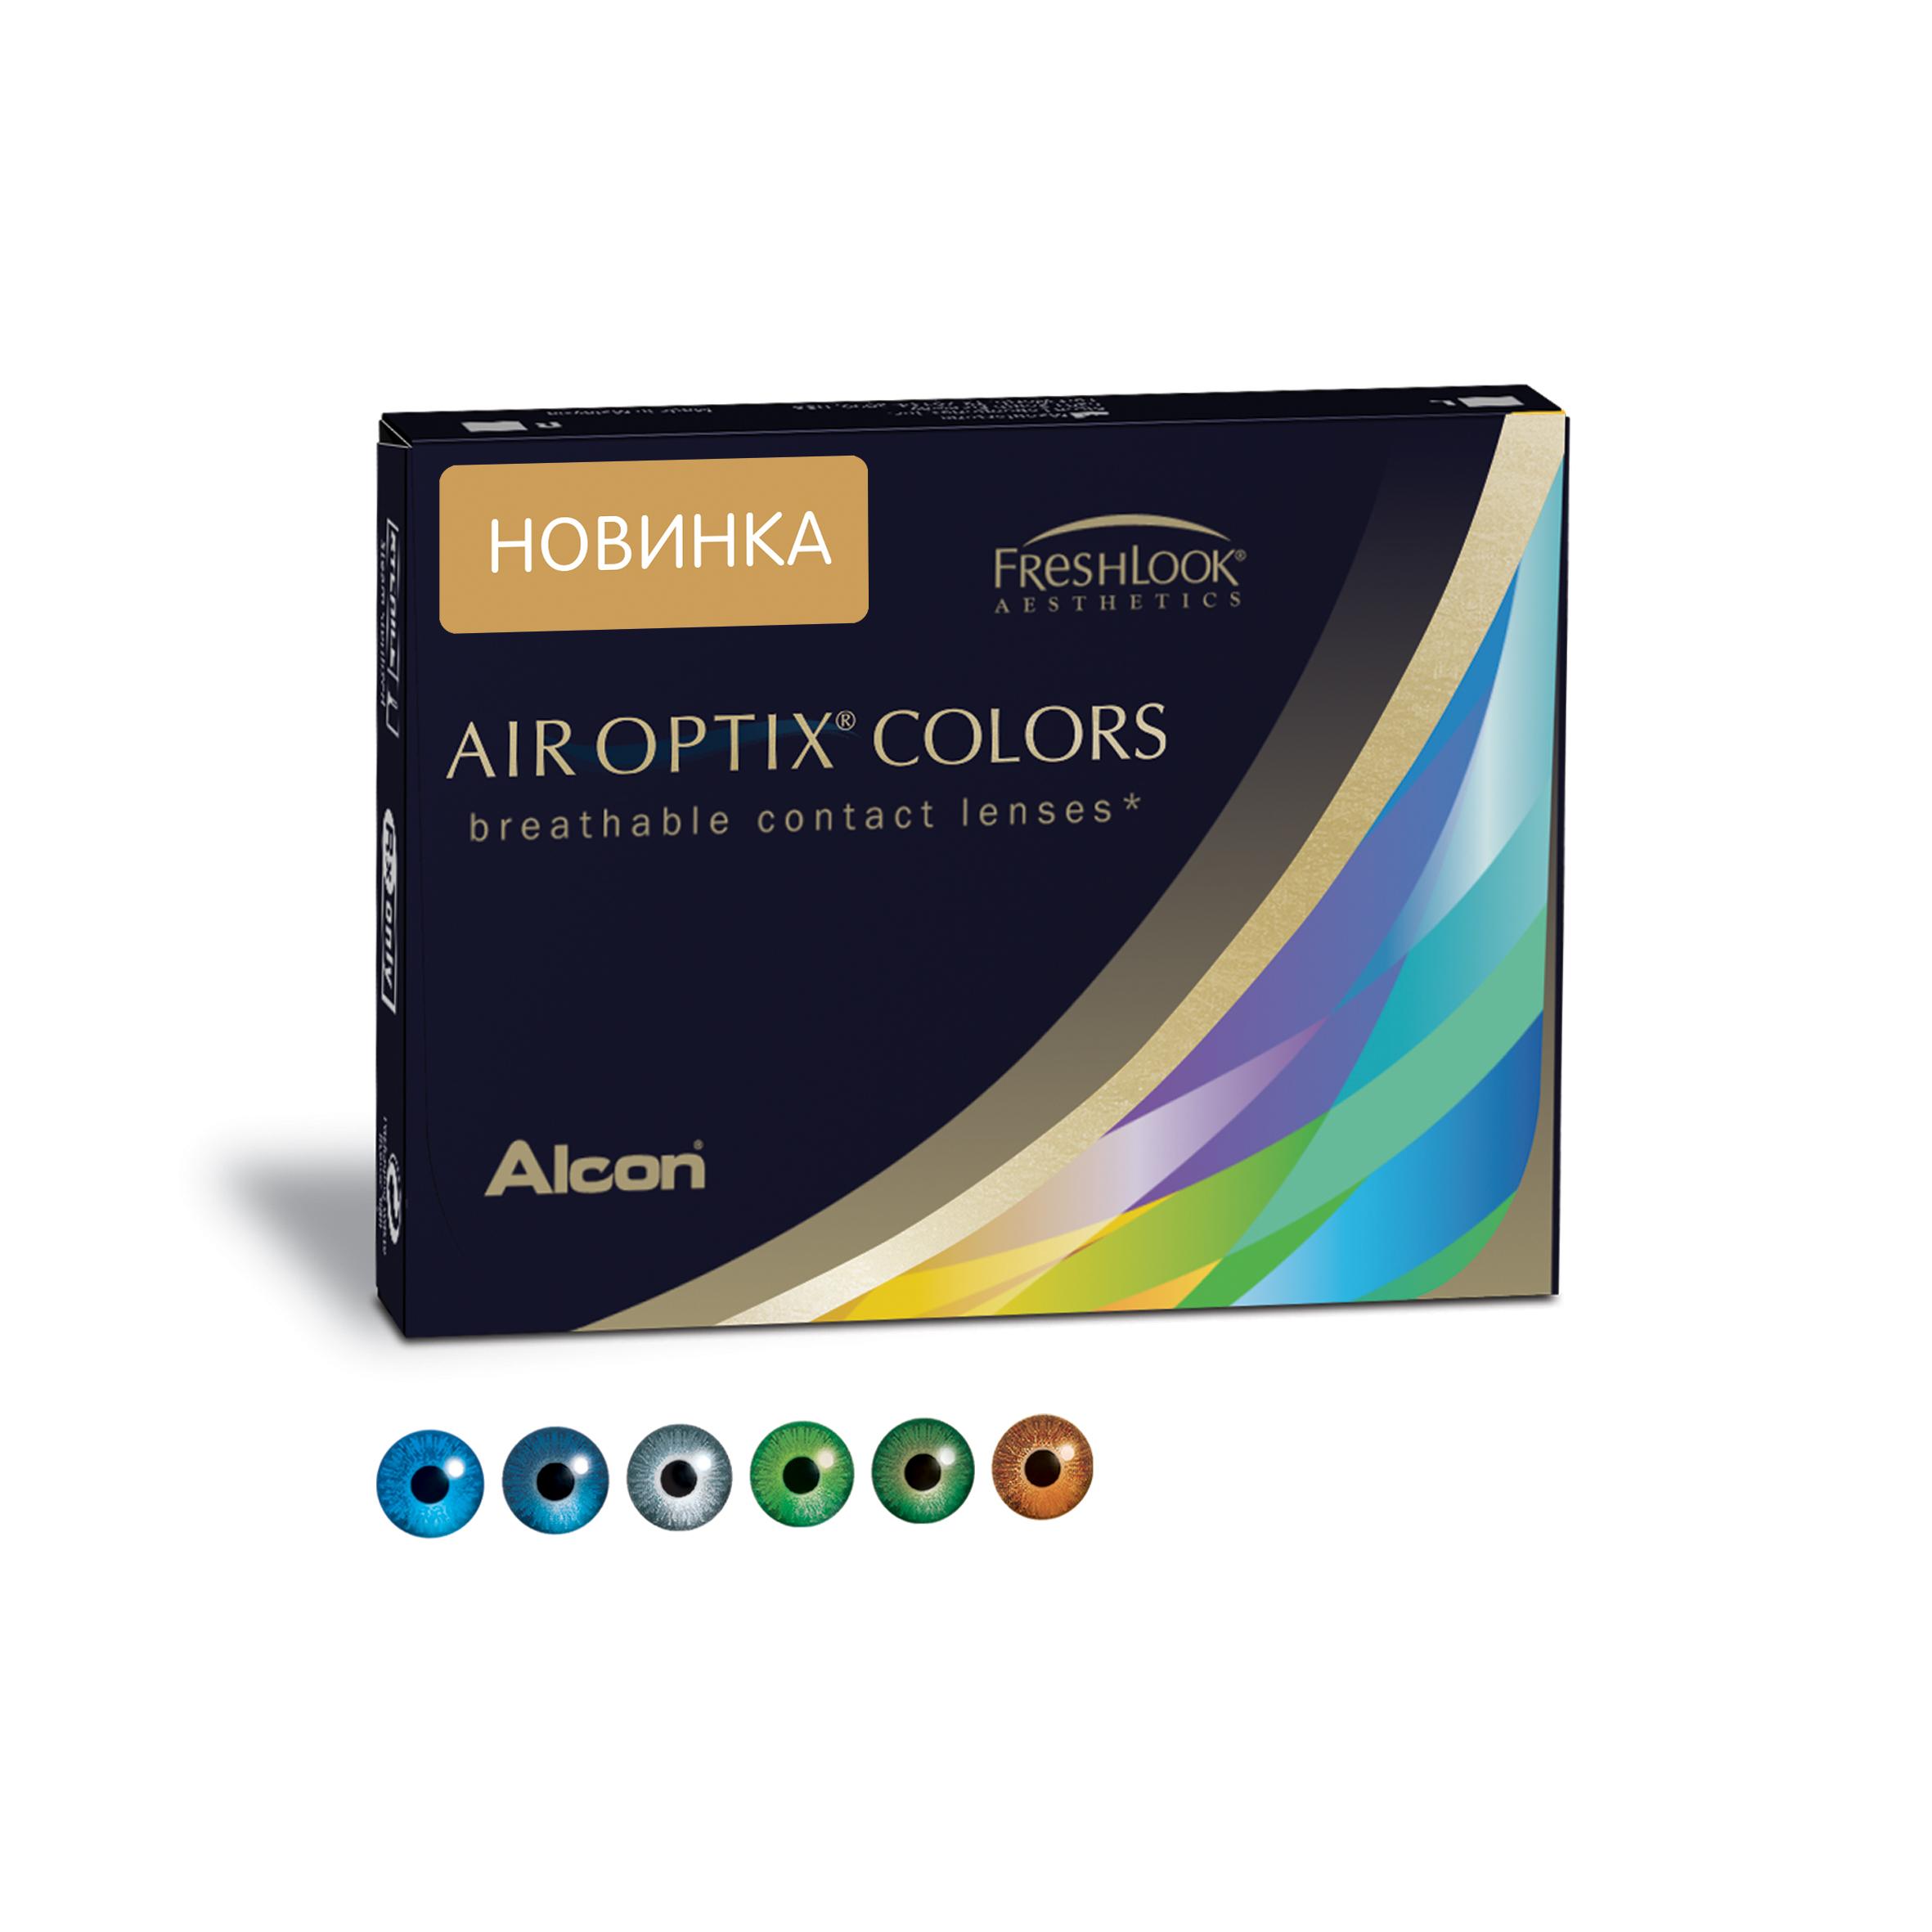 Аlcon контактные линзы Air Optix Colors 2 шт -2.00 Green31746162Мягкие контактные линзы